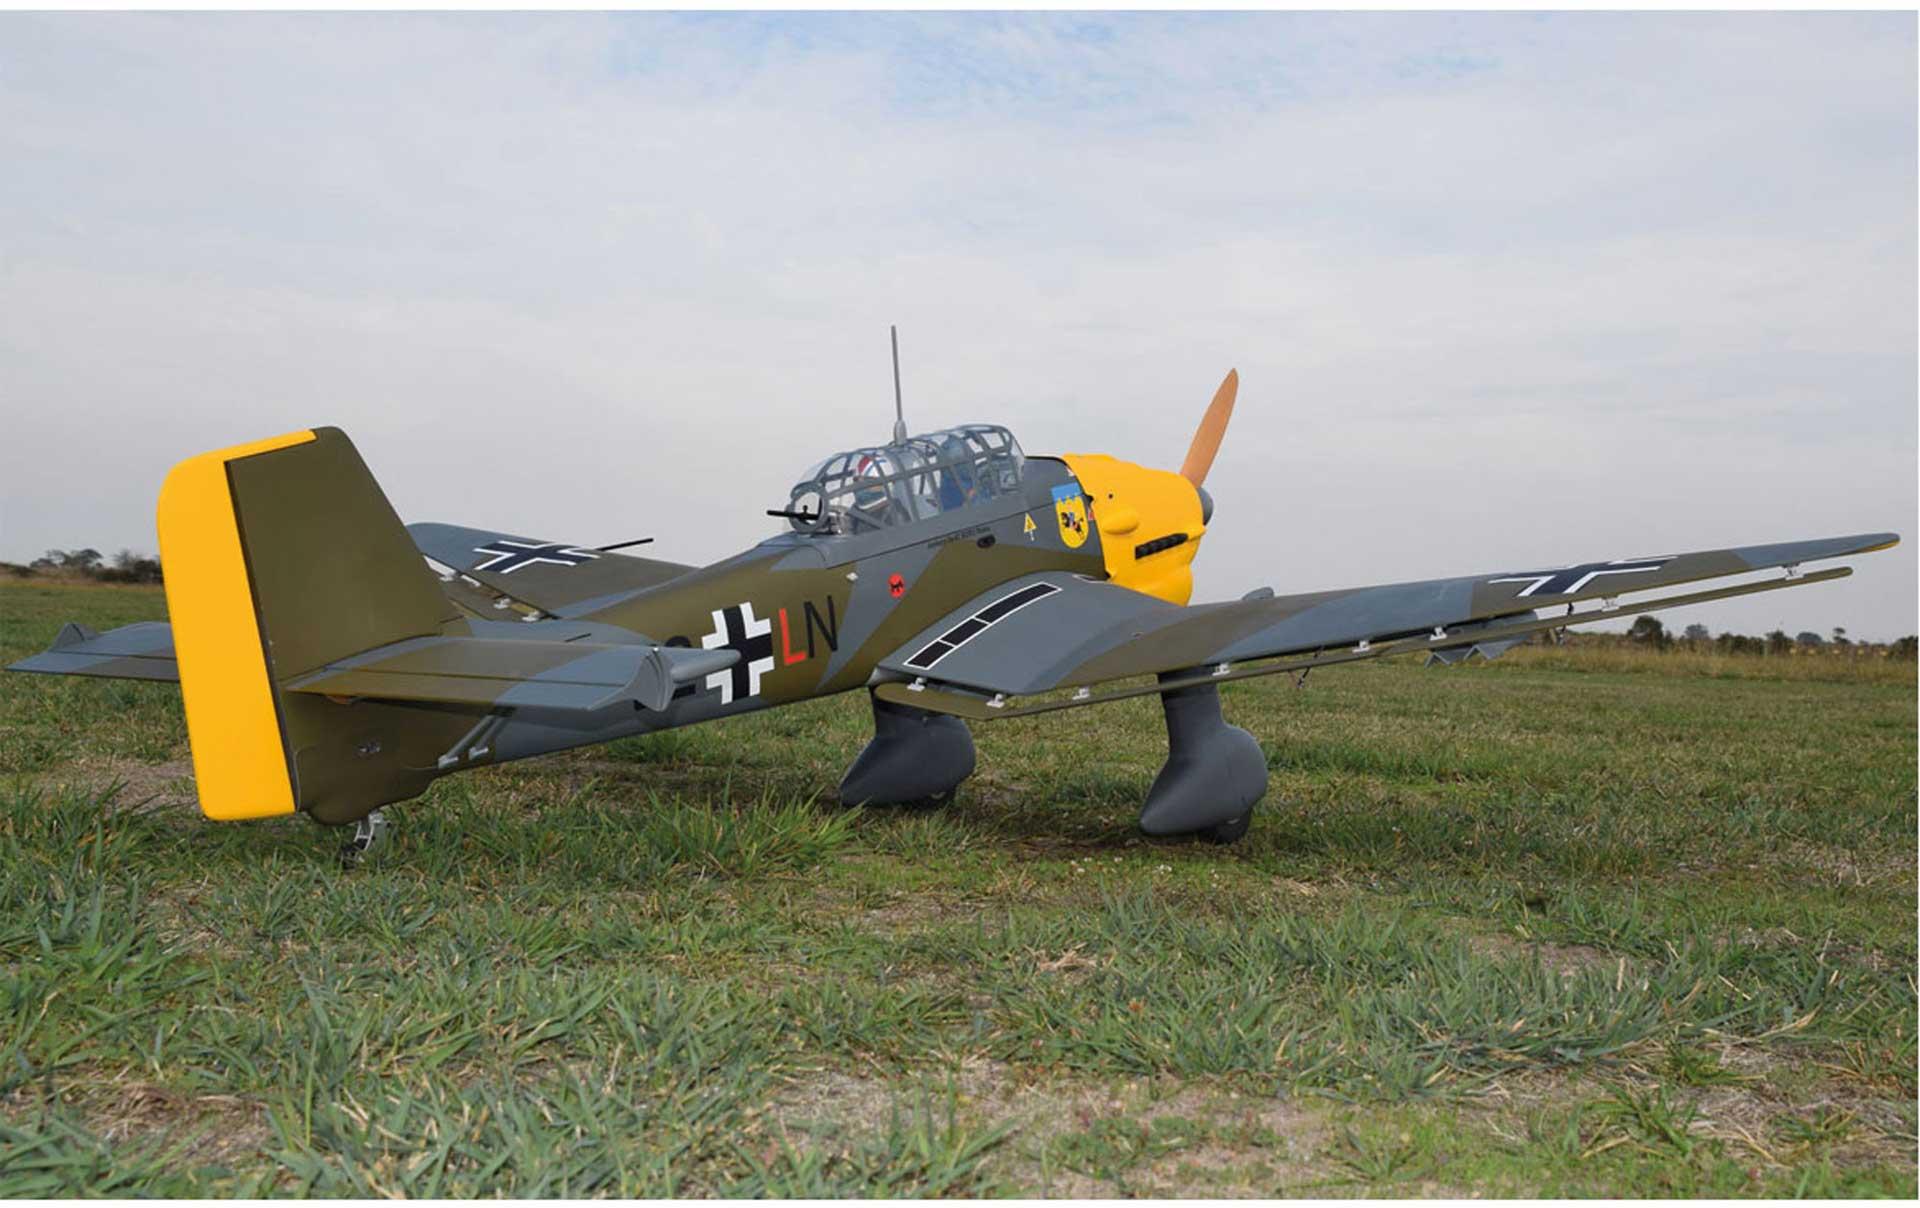 SG-MODELS JU-87 STUKA ARF WARBIRD